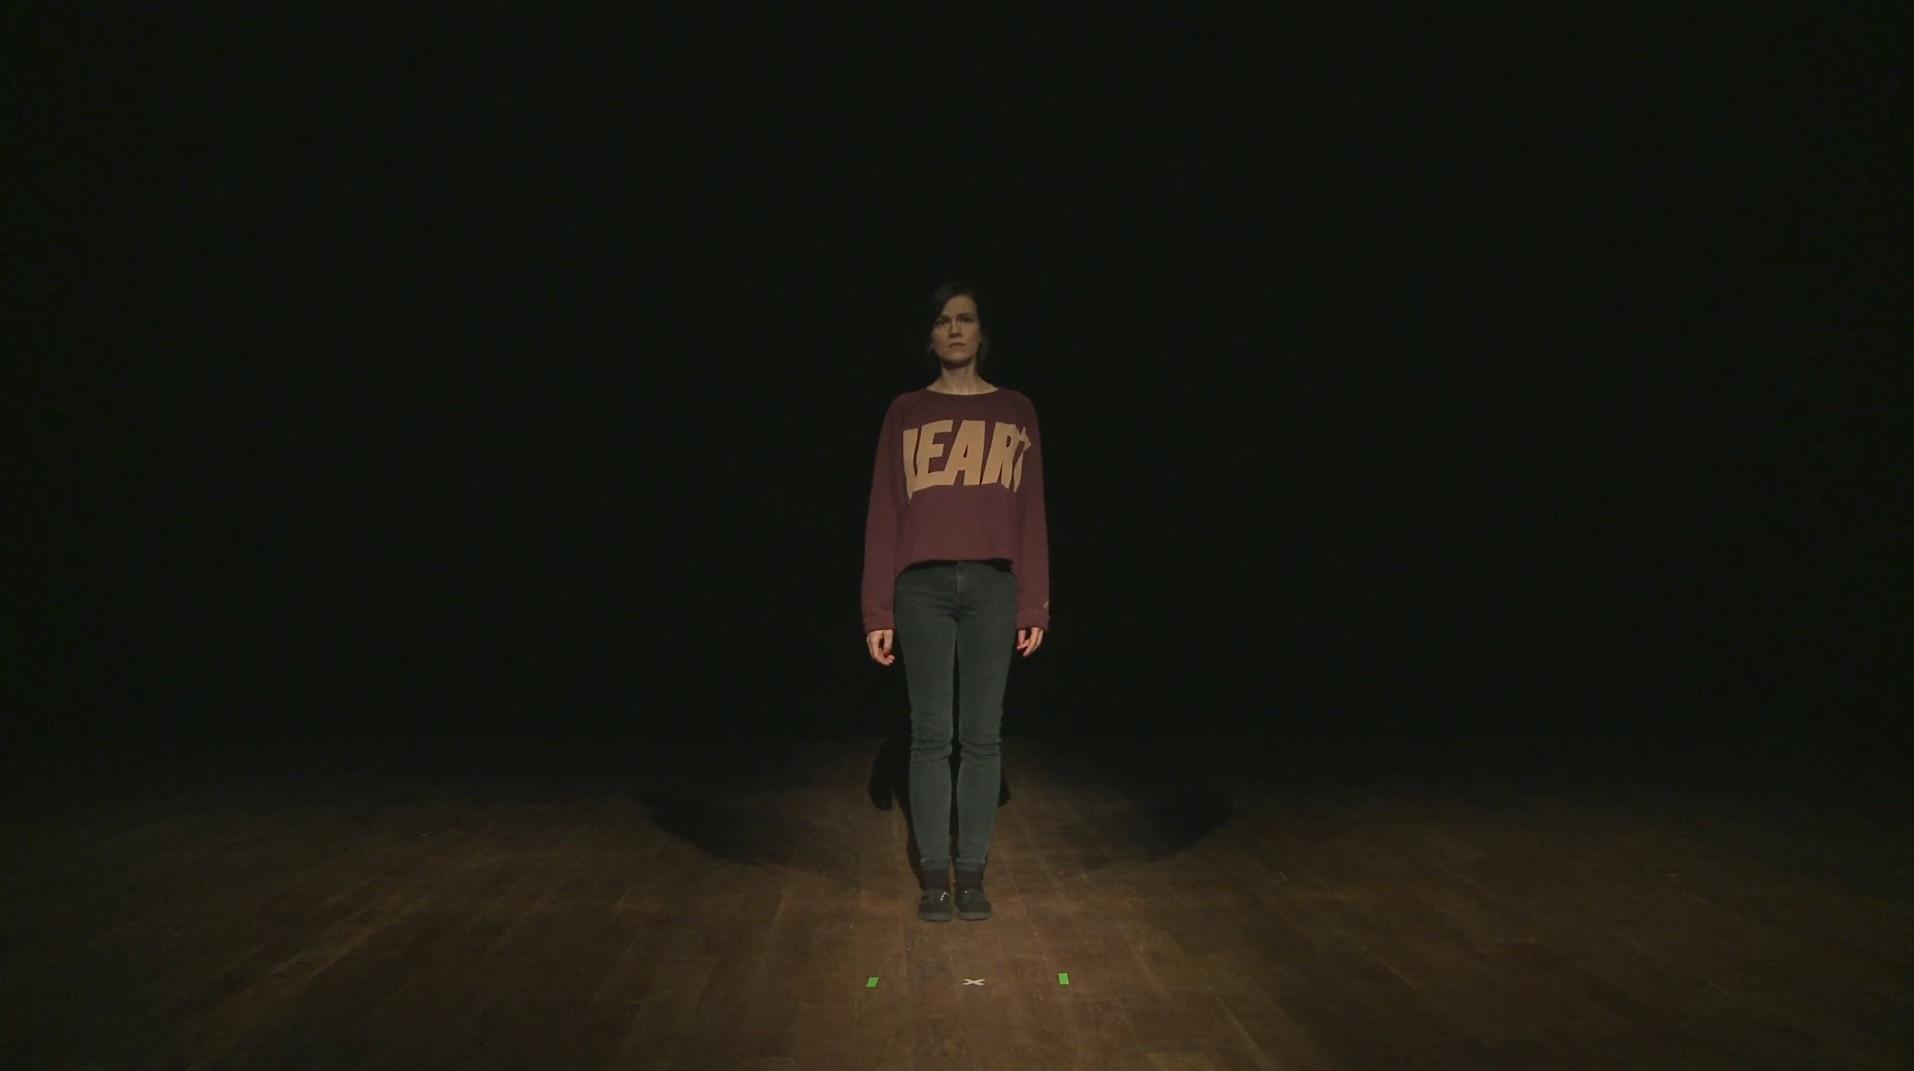 'Birthday' (Micro Theatre), dir. by Anna Karasińska, premiere: 12. 11. 2016, produced by Komuna//Warszawa. Photo: Pat Mic.